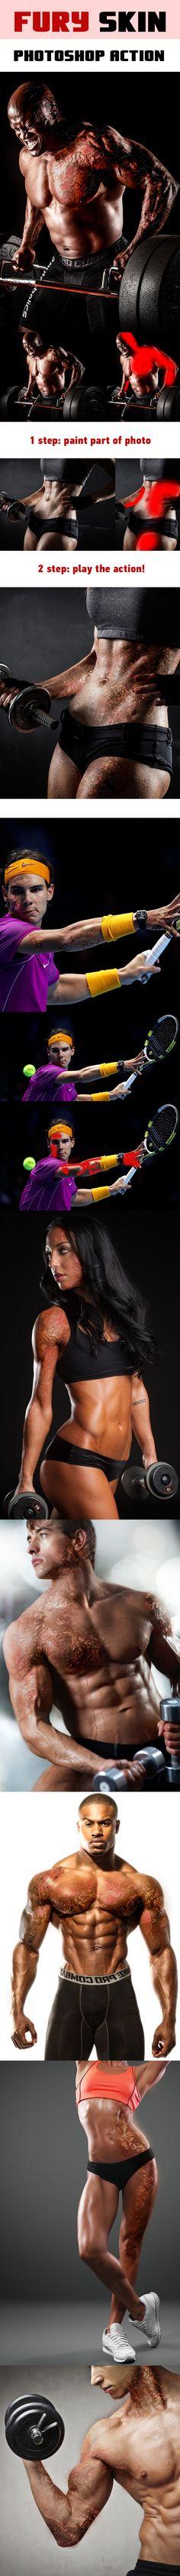 Fury Skin Photoshop Action. Download here: http://graphicriver.net/item/fury-skin/15762471?ref=ksioks